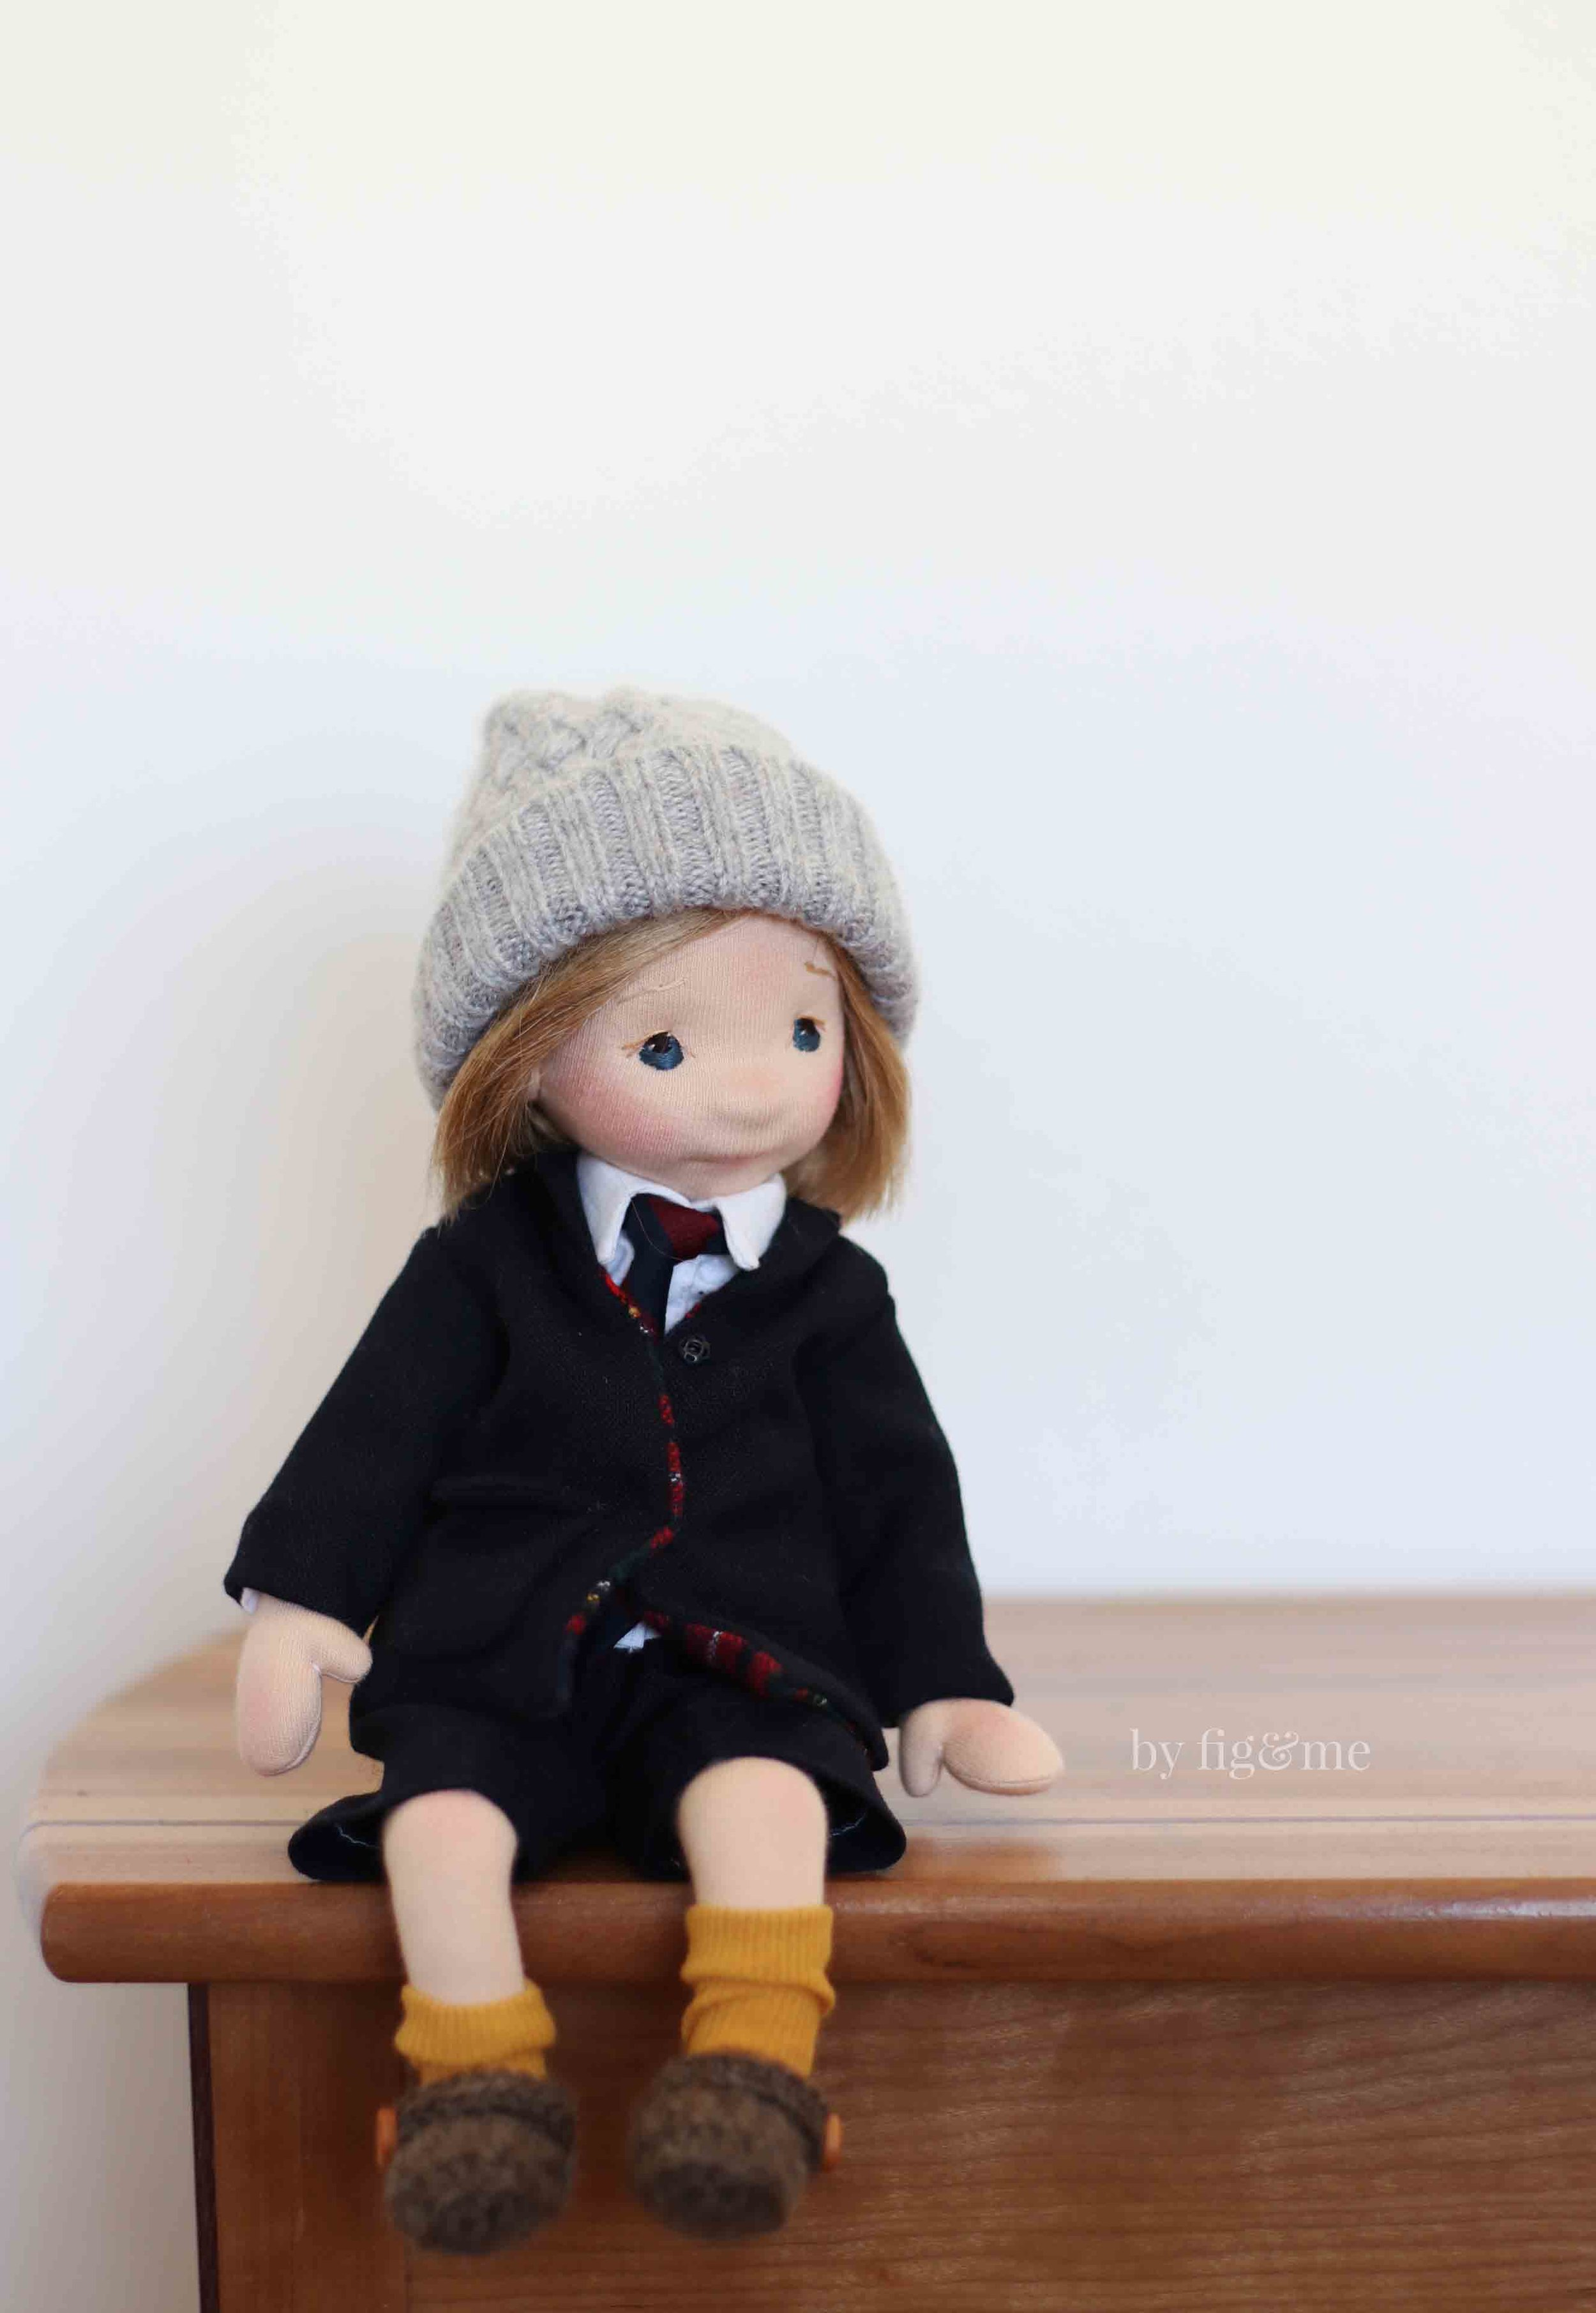 Monsieur Yuki, a cloth art doll.